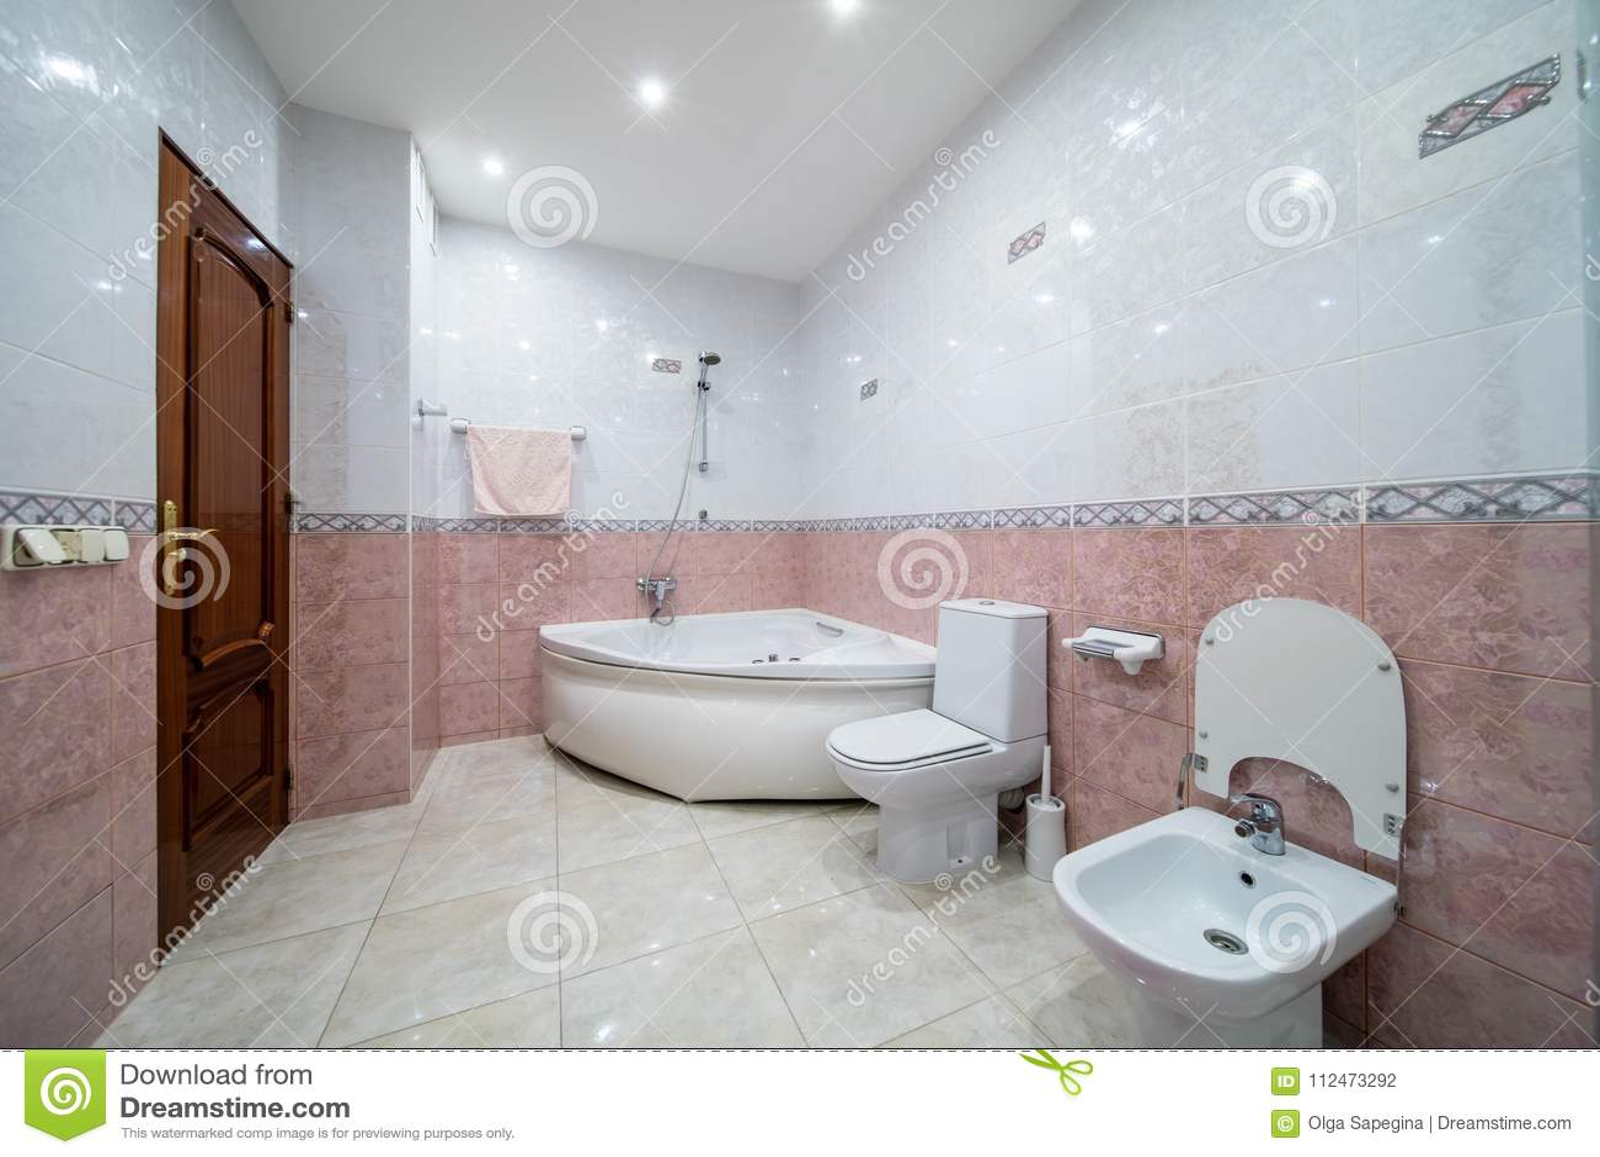 Small beige bathroom stock photo. Image of floor, faucet - 112473292